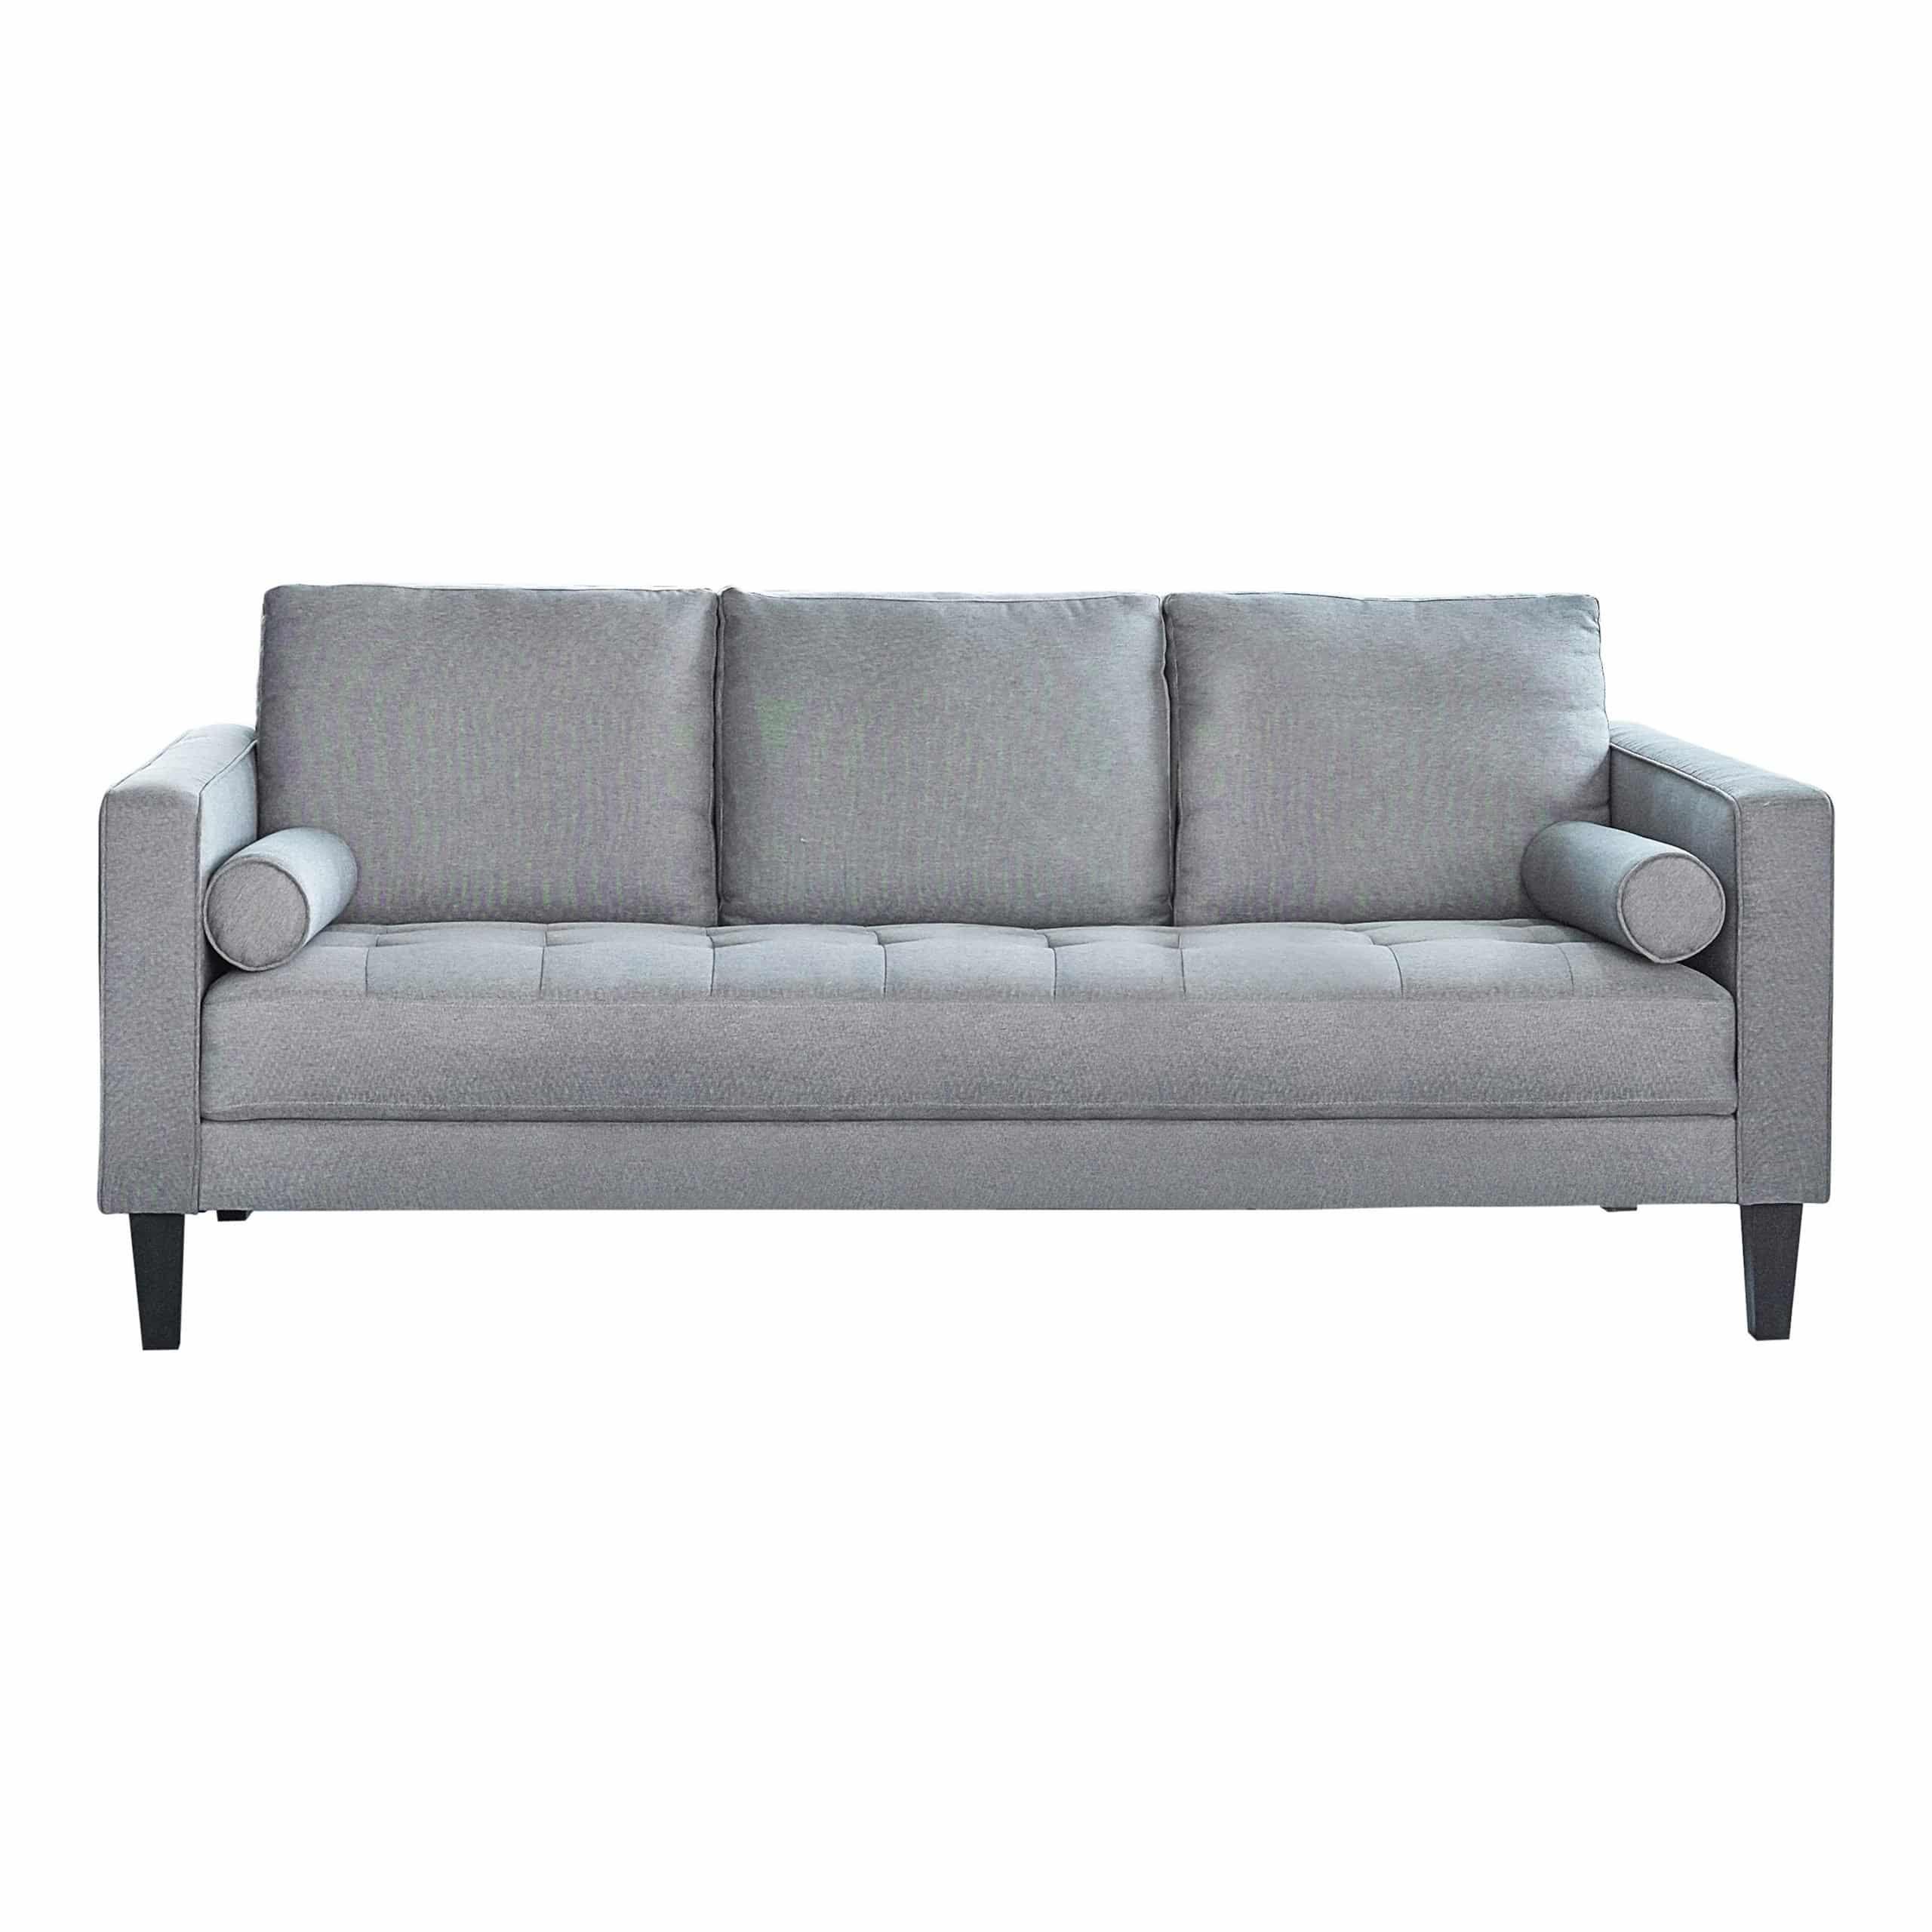 509051 lennox grey sofa set